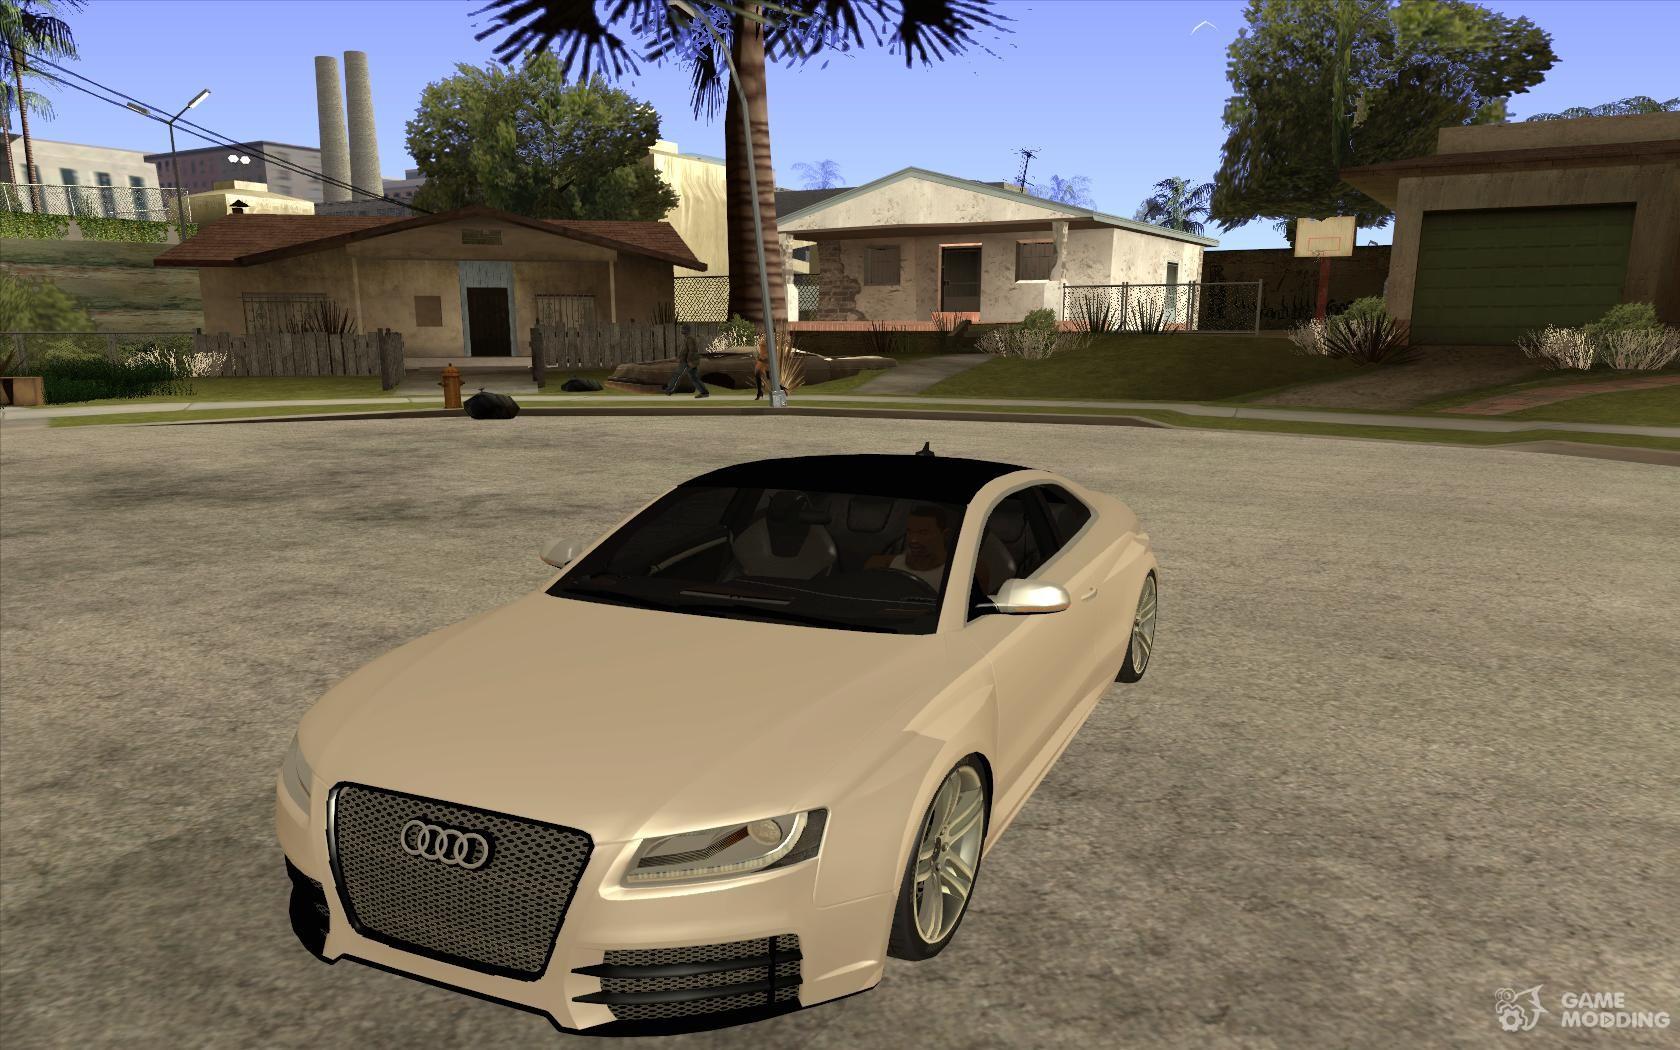 Audi S Quattro Car Tuning For GTA San Andreas - Audi car gta 5